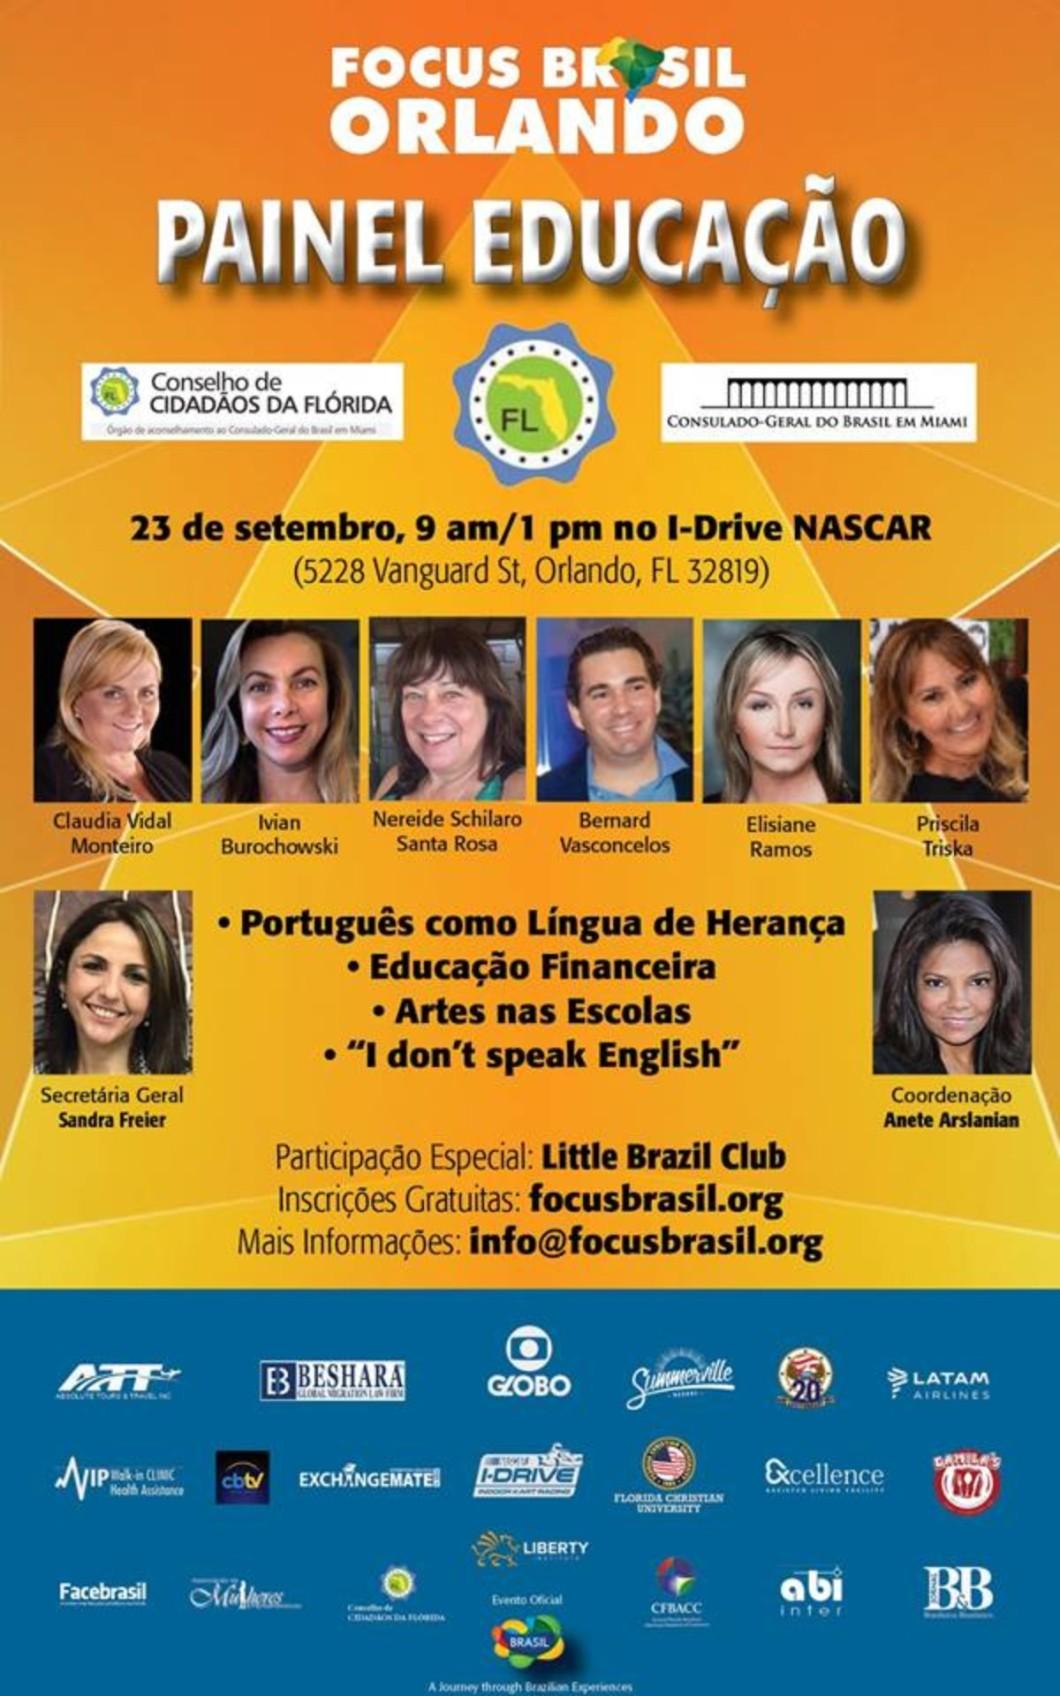 Focus_Brazil_Orlando_2017